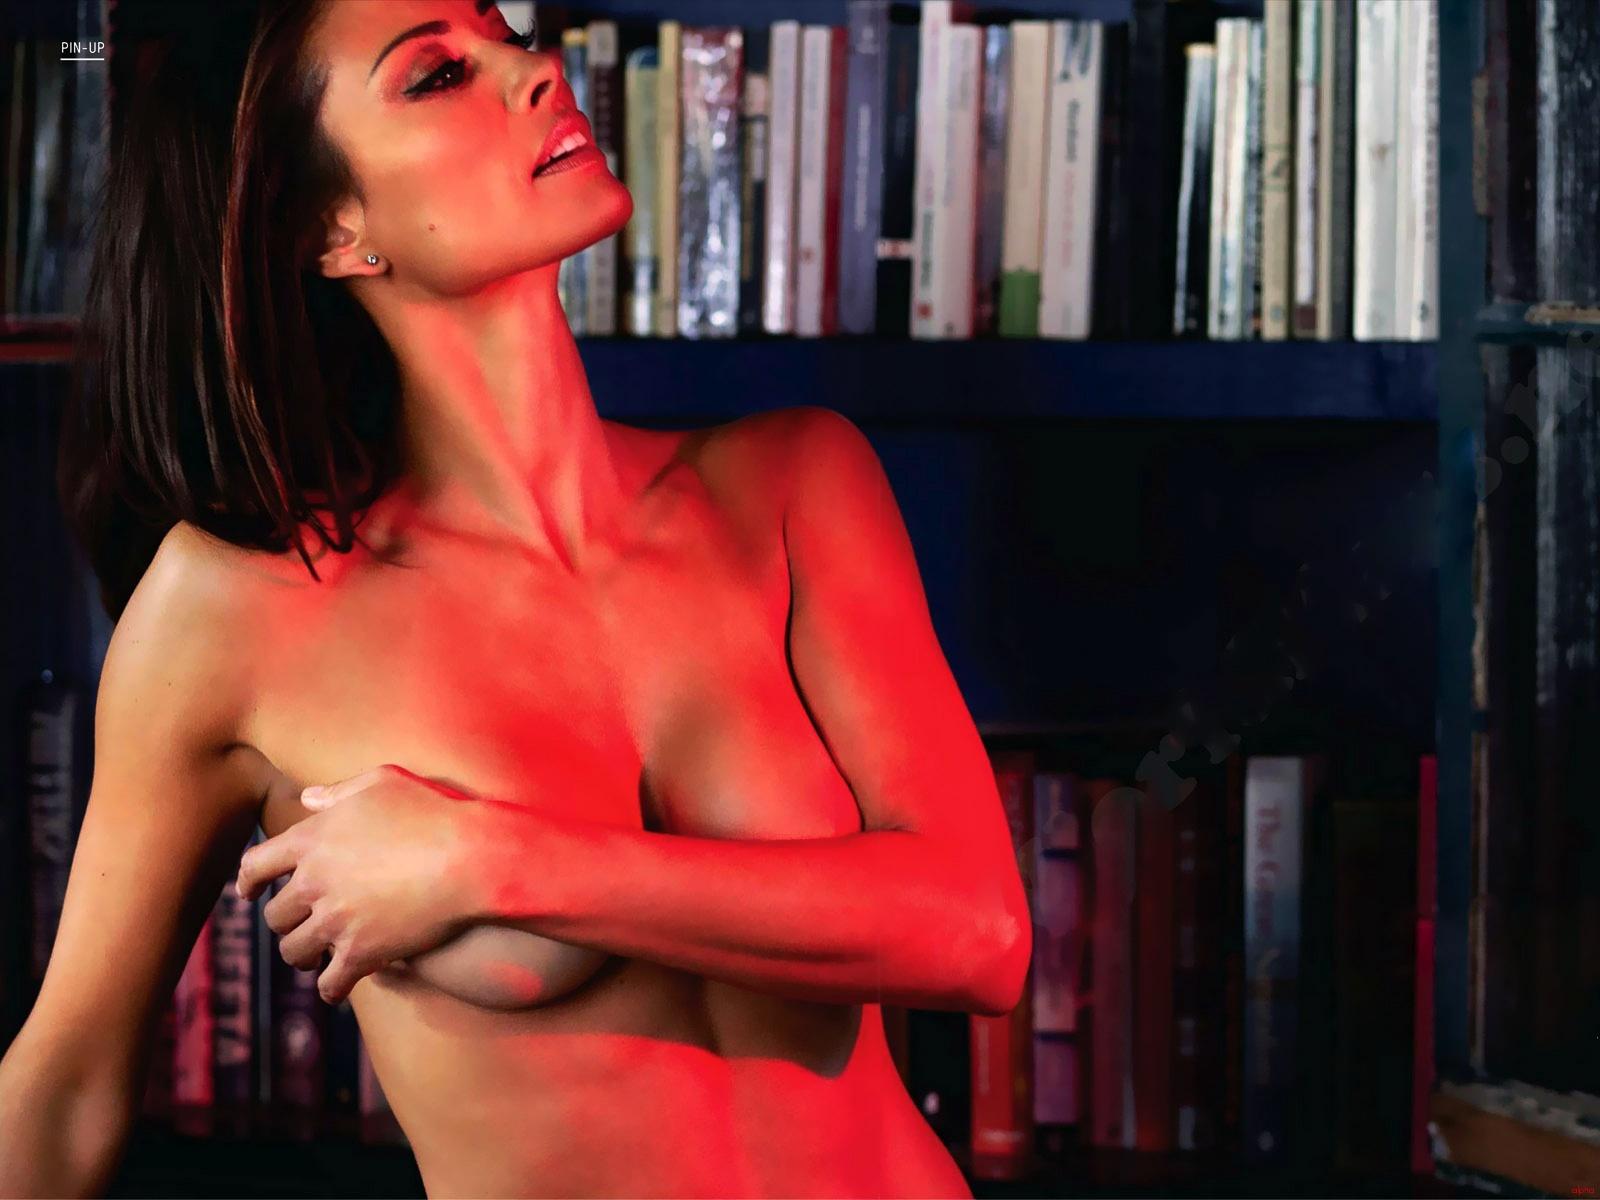 suranne jones nude scene